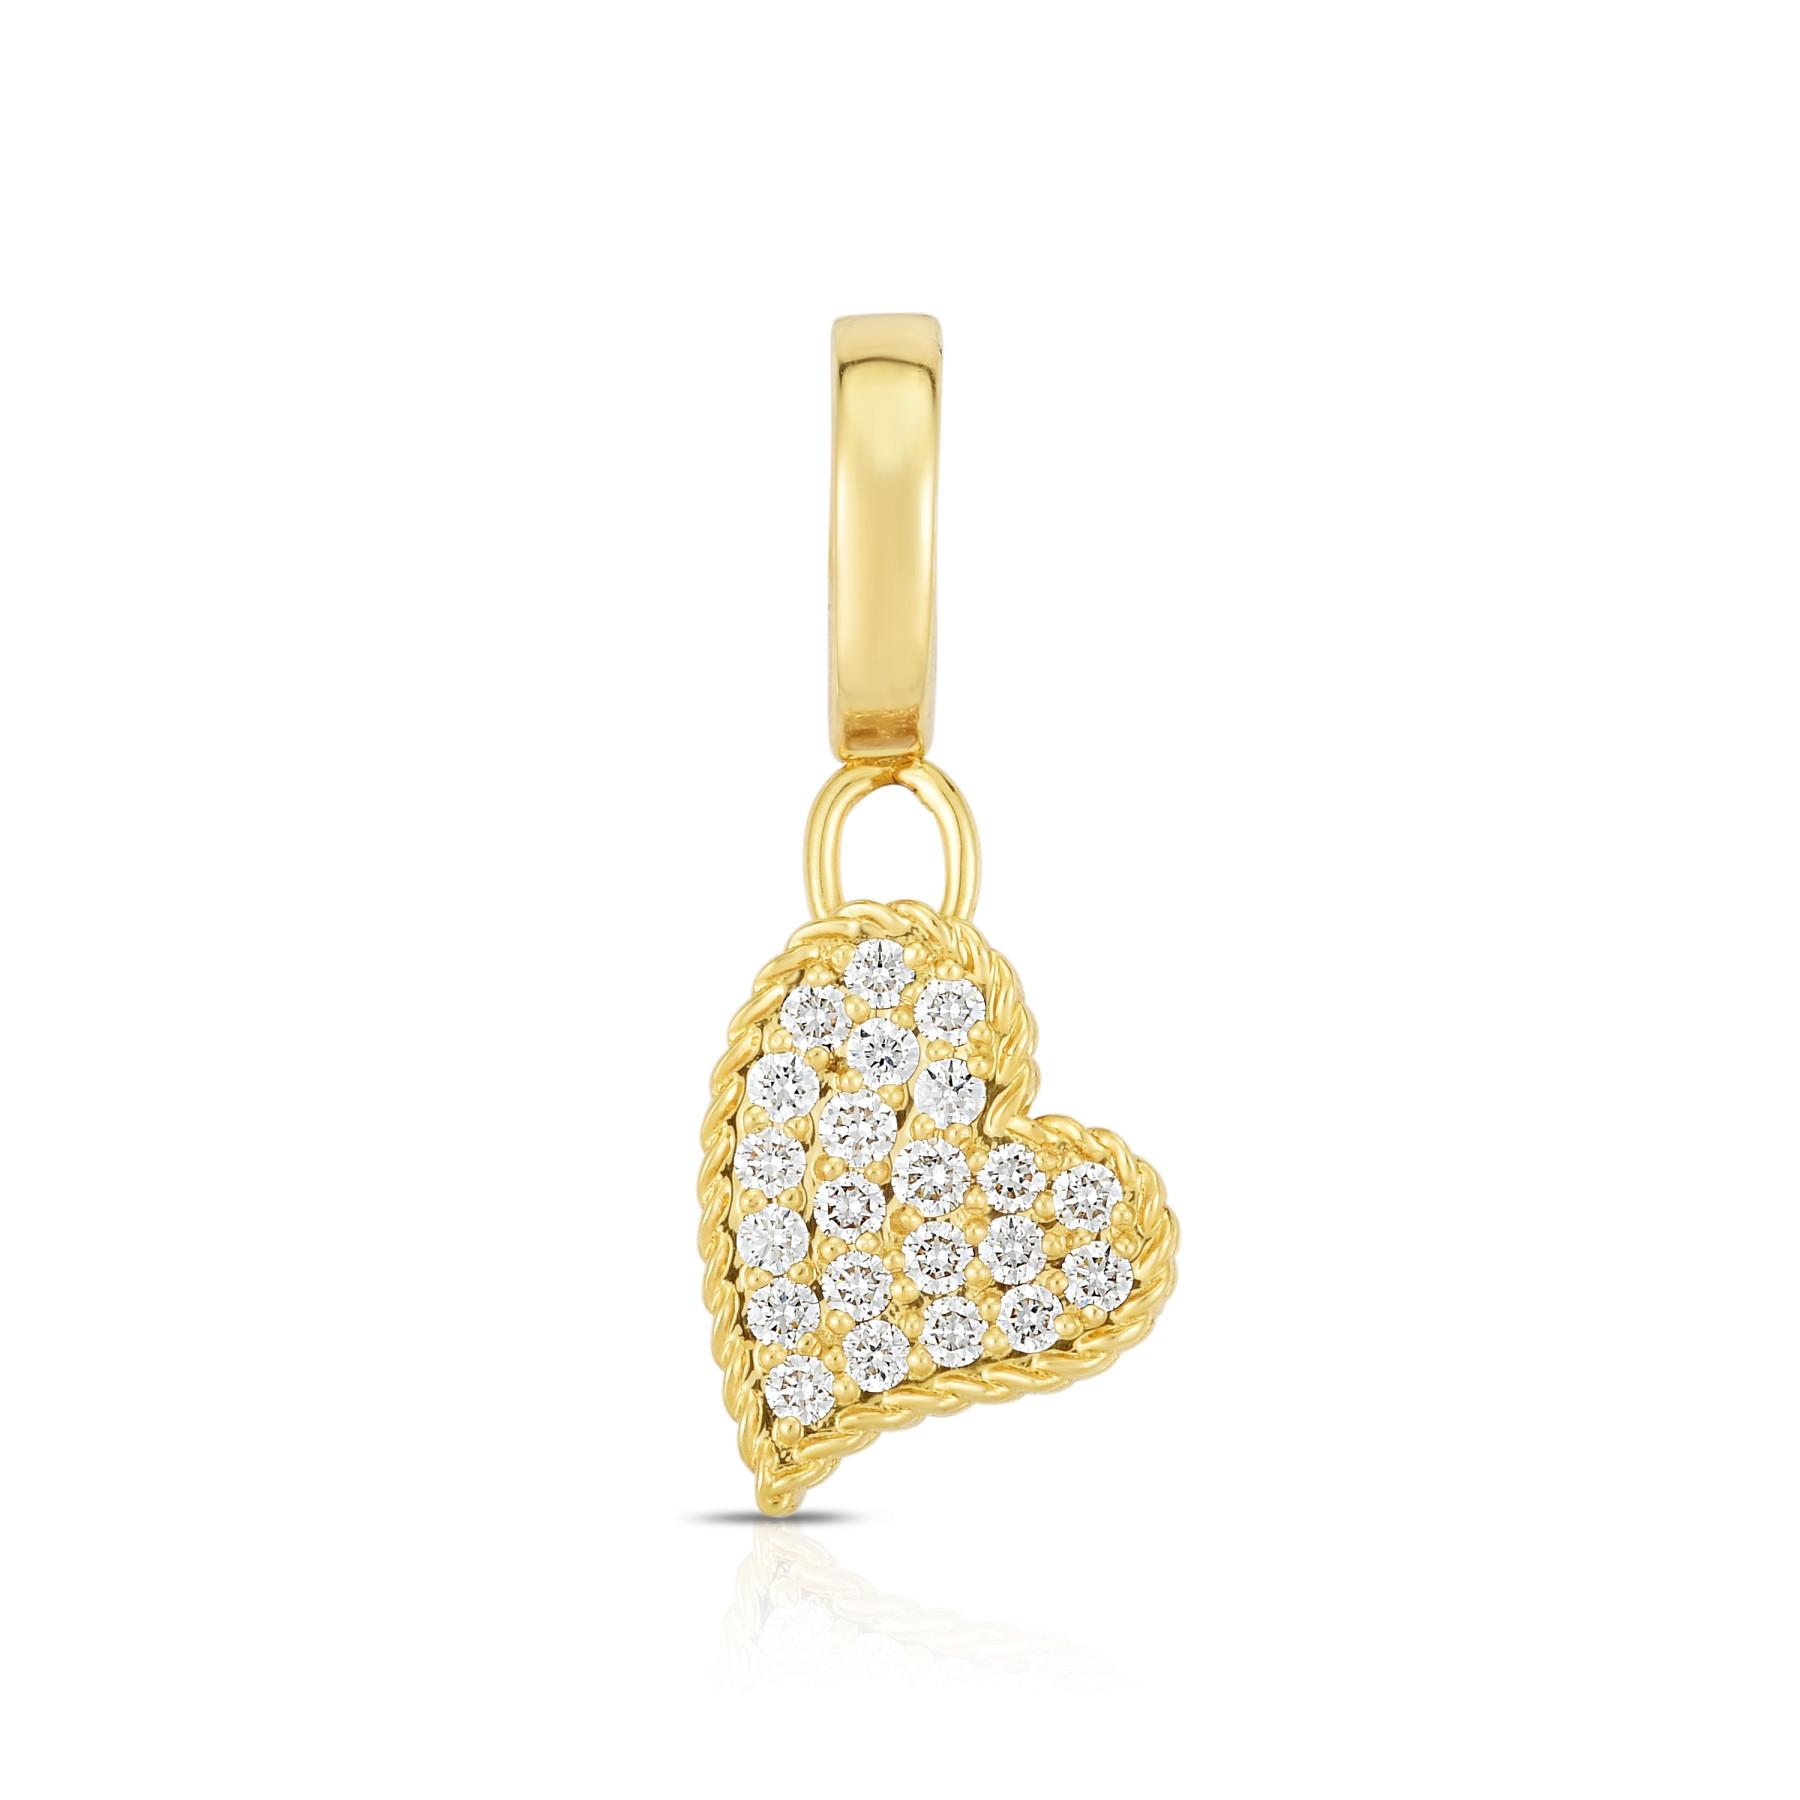 Roberto Coin Diamond Heart Charm in Yellow Gold